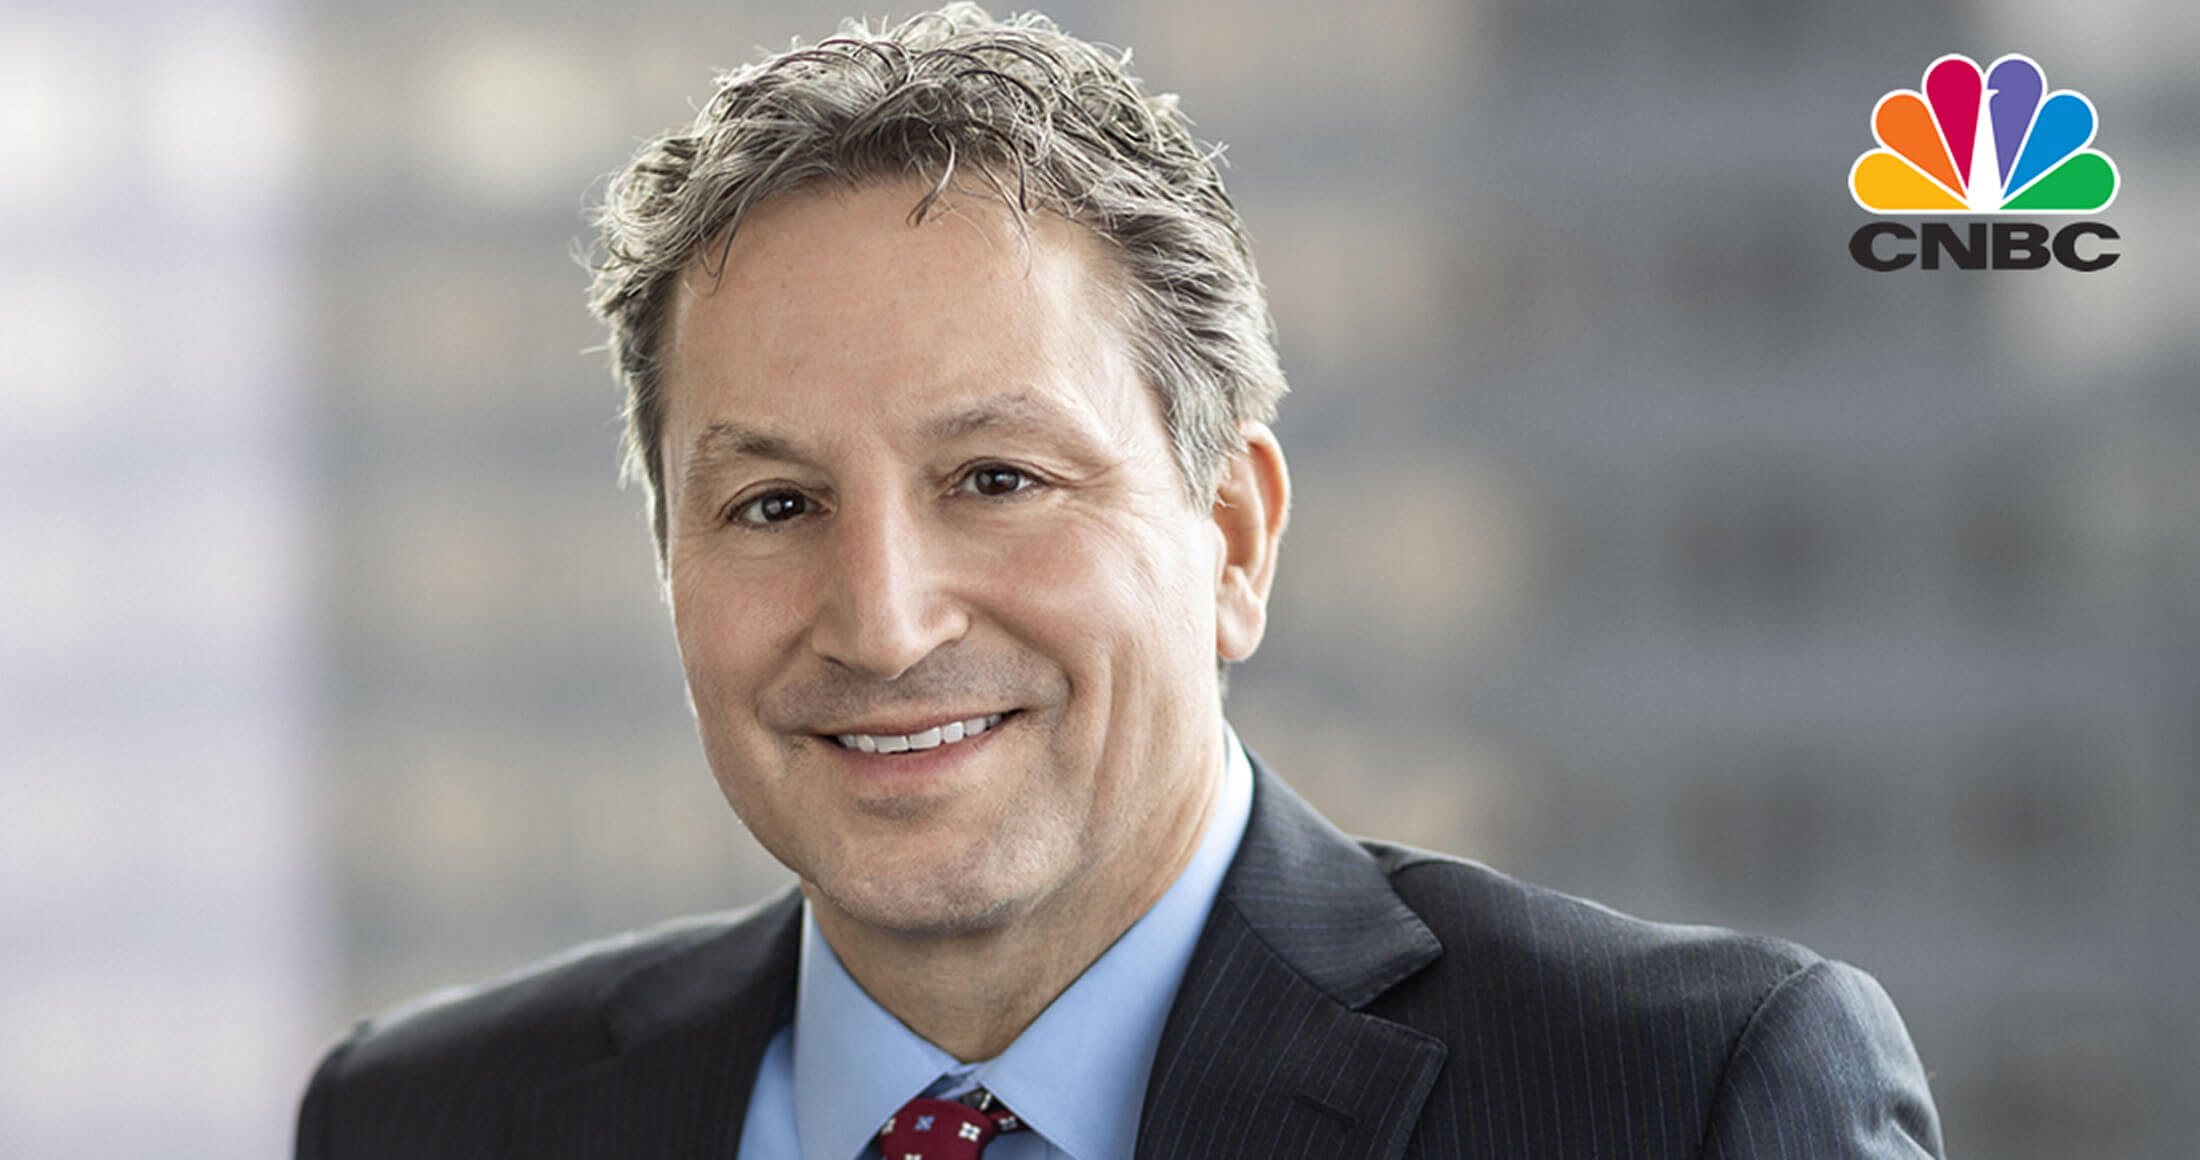 David Herro on CNBC